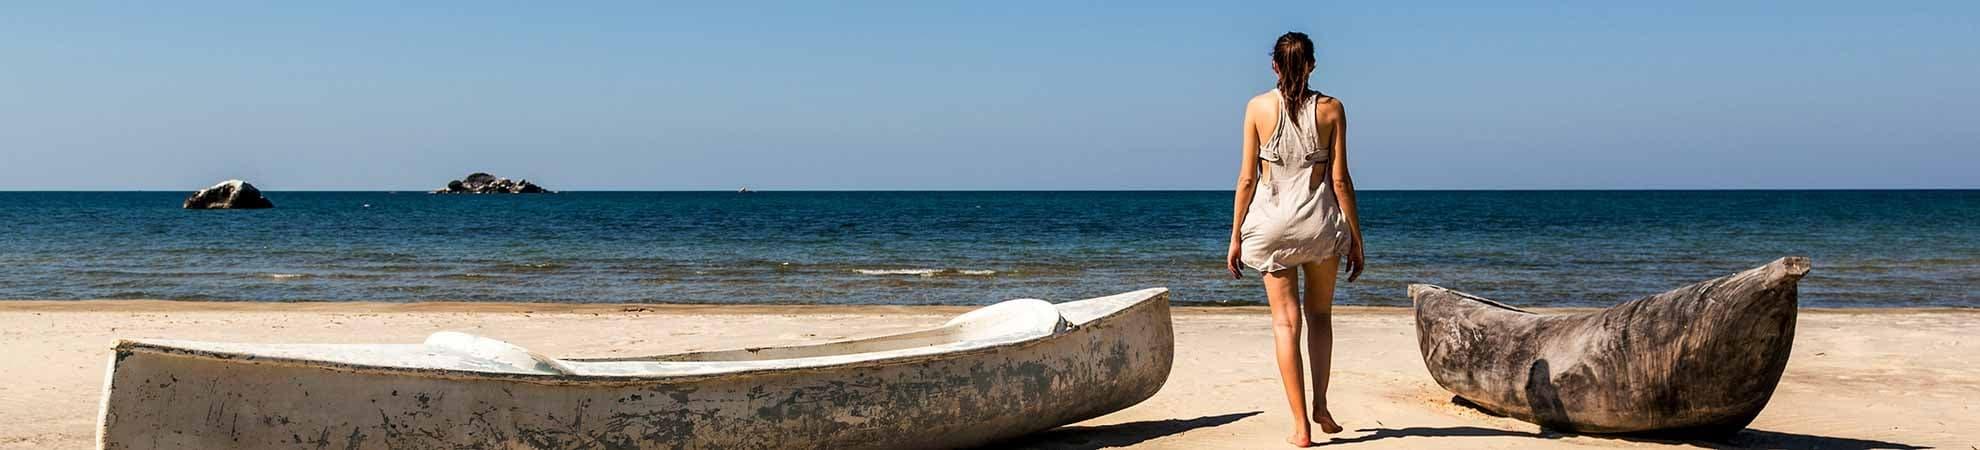 Fiche Pays Malawi